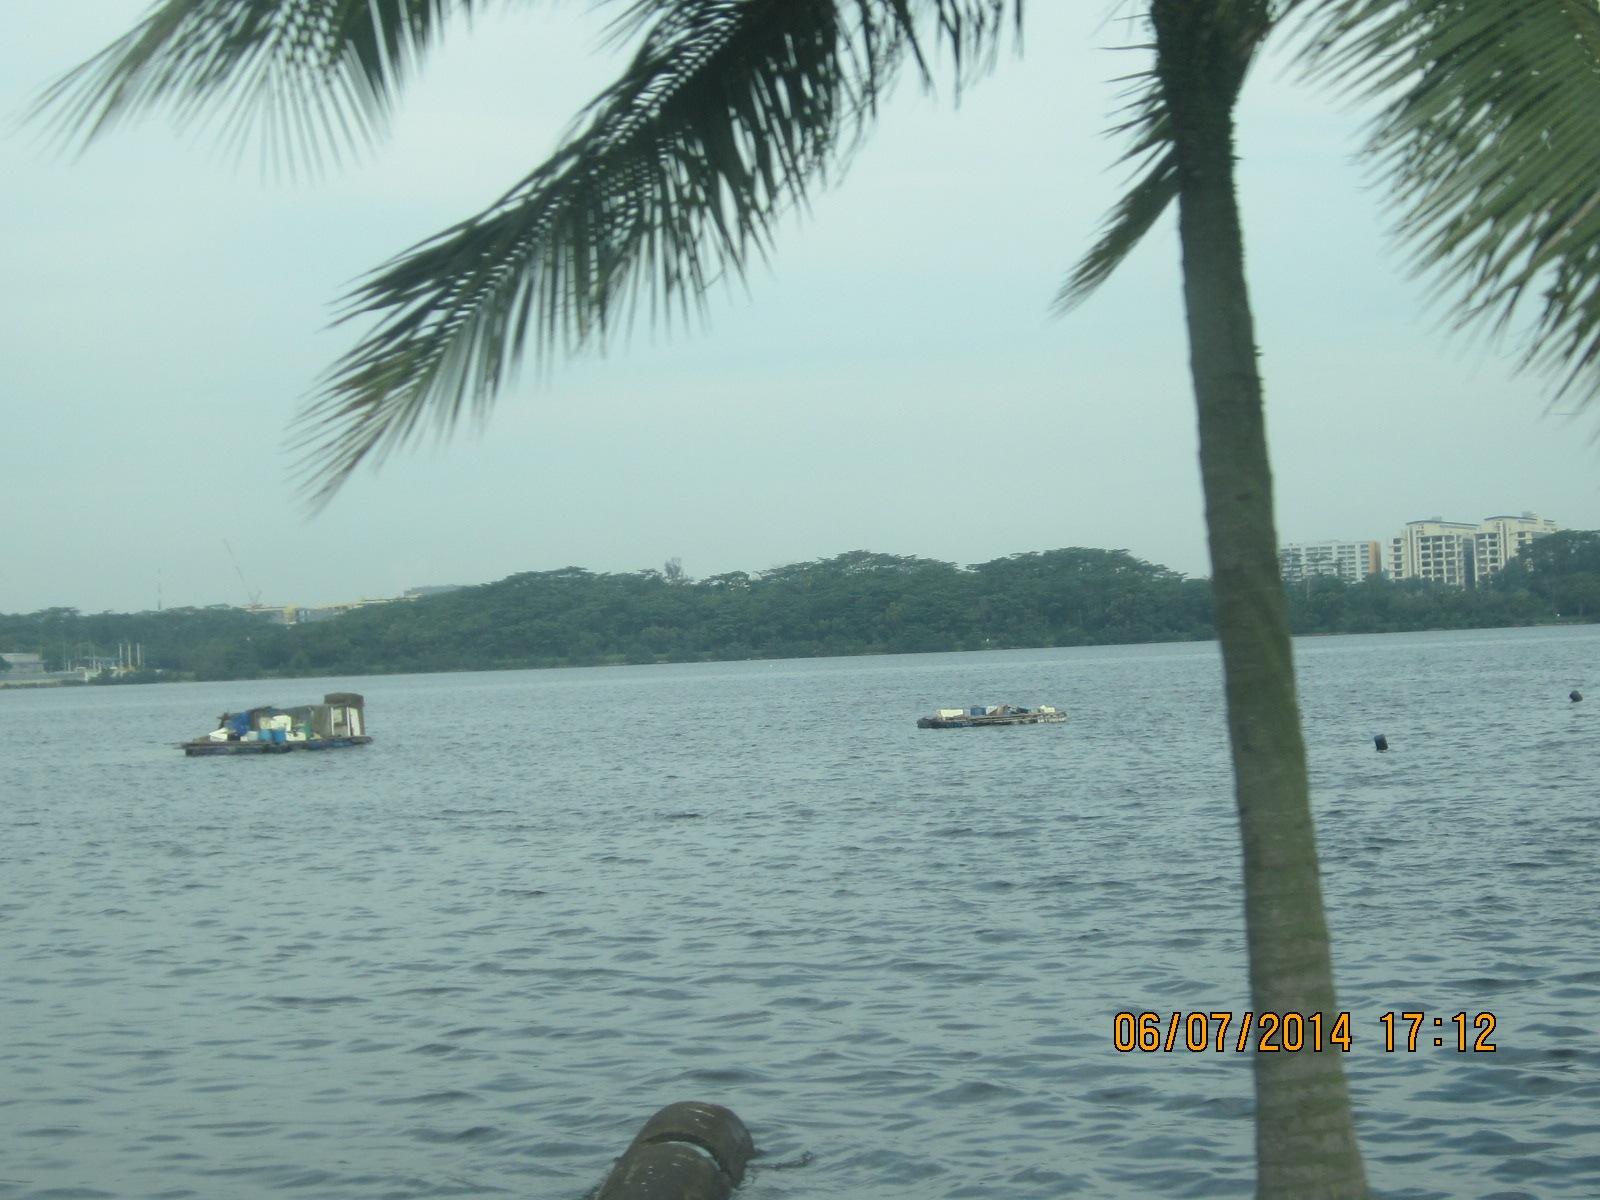 Sea view of Johor Bahru, Malaysia by amie